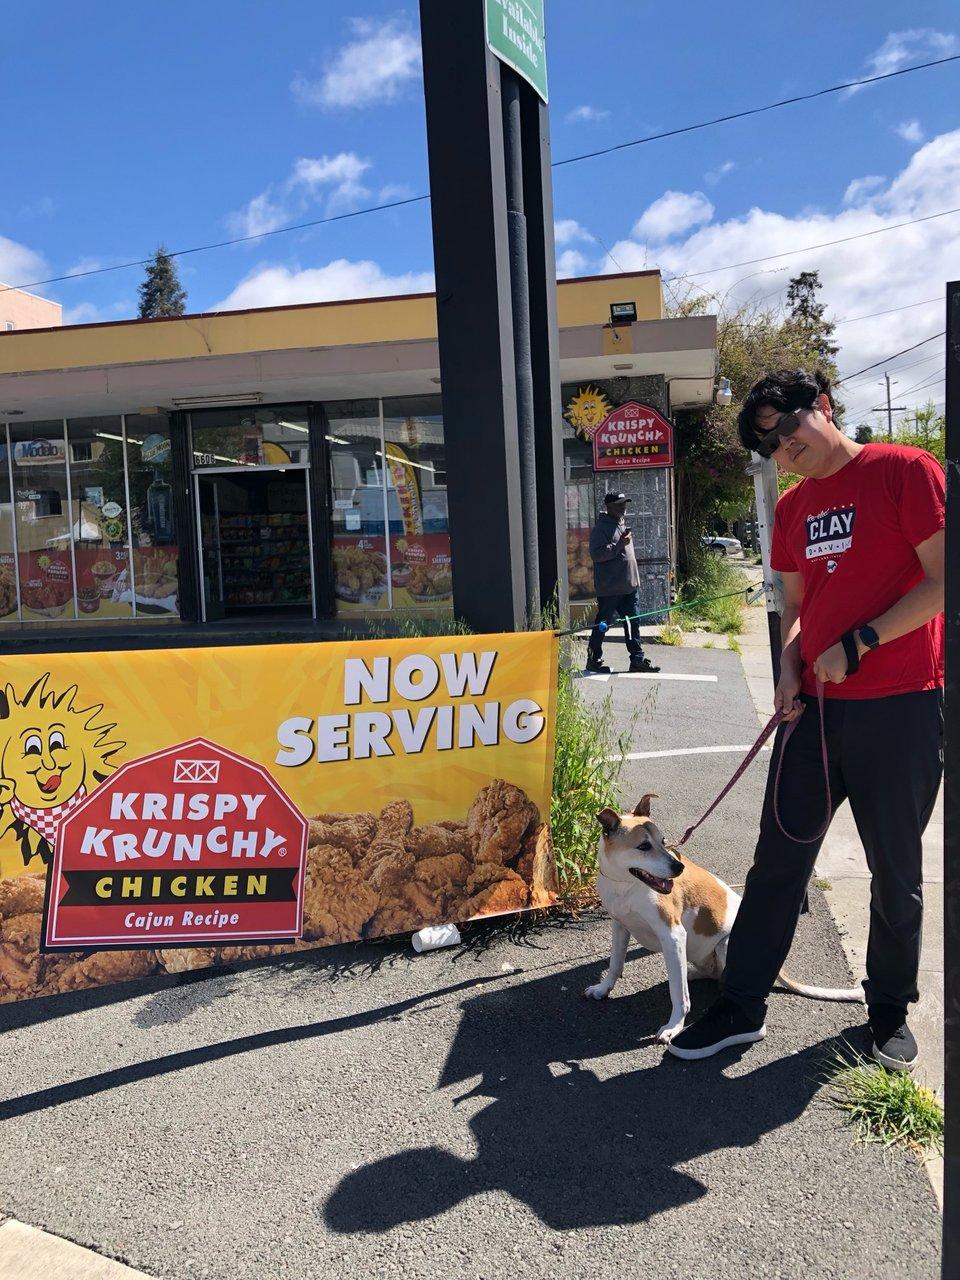 Krispy Krunchy Chicken 6606 Telegraph Ave, Oakland